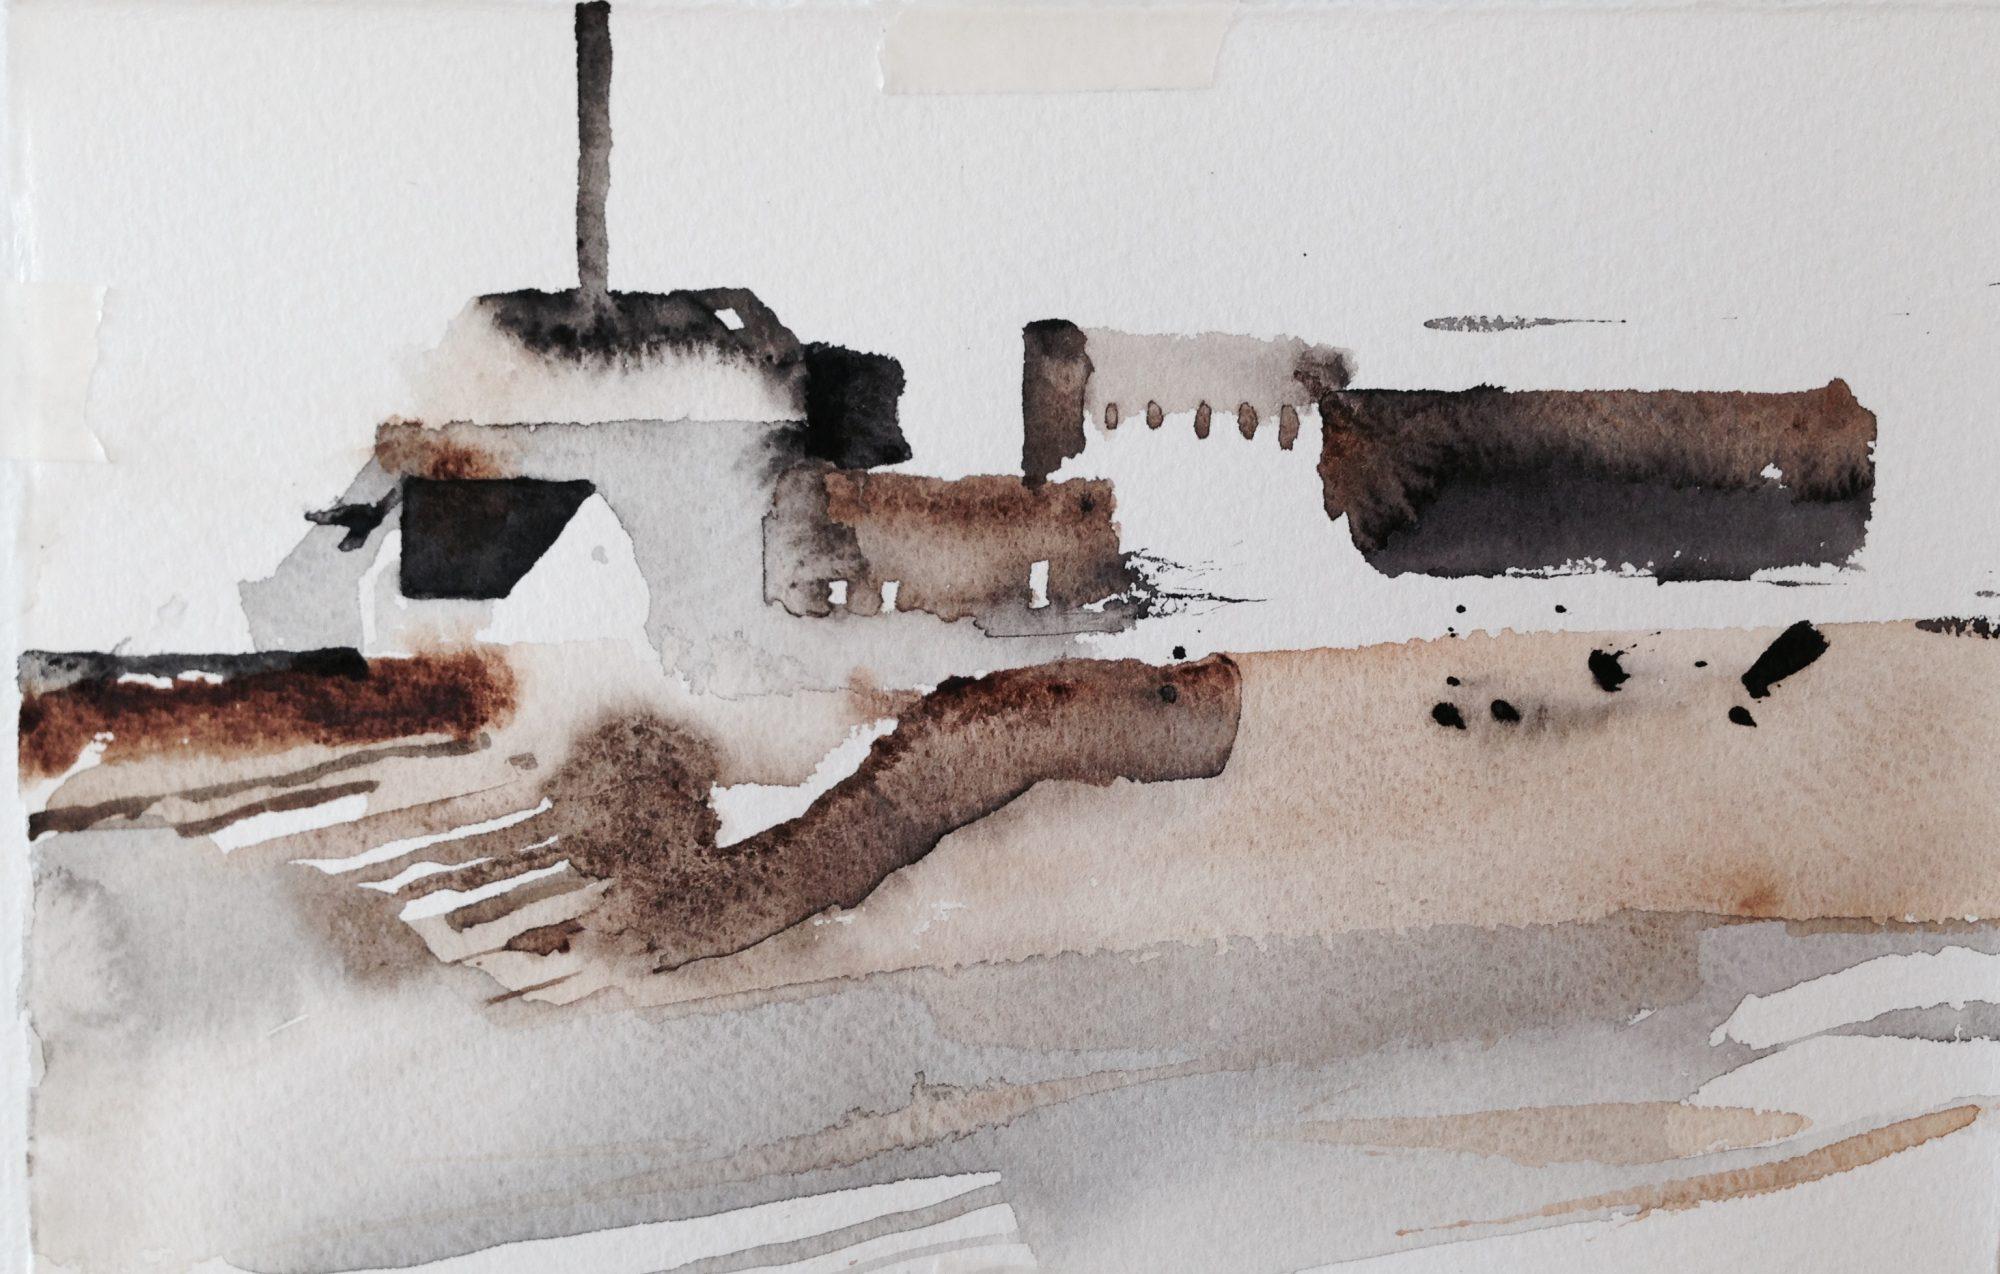 Kari Kolltveit